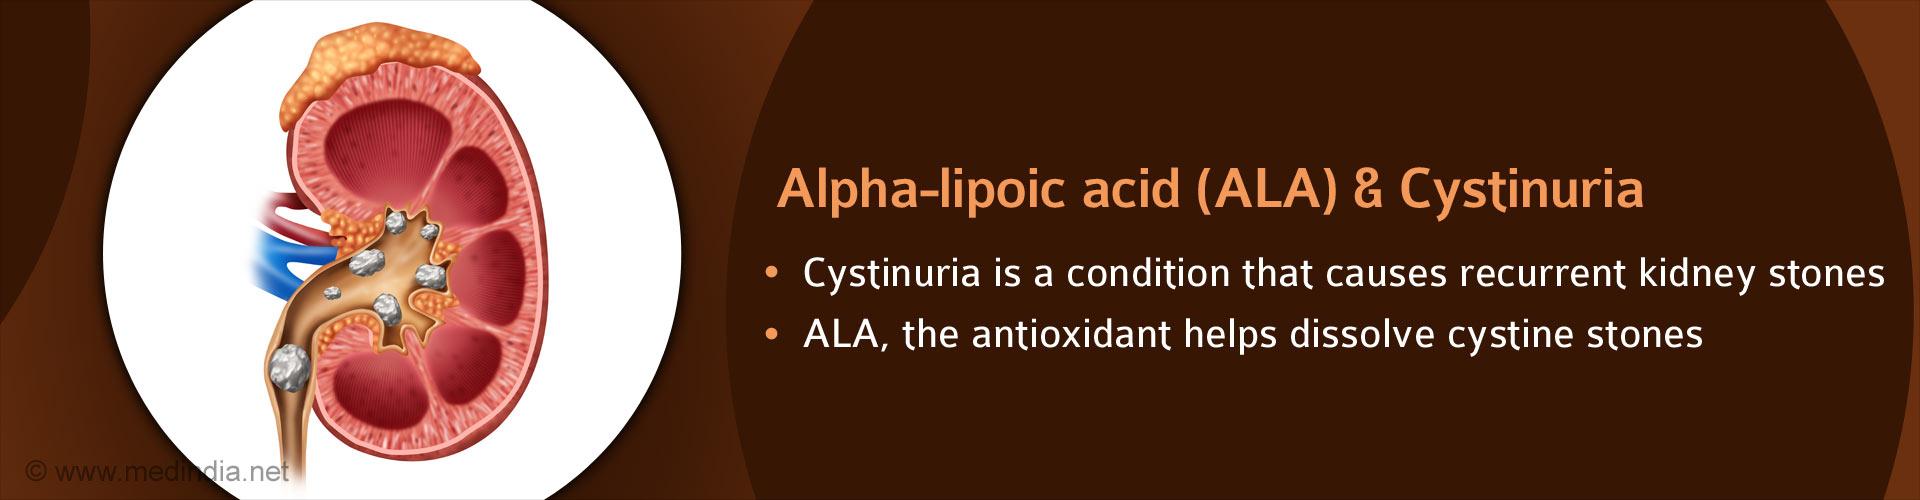 Alpha-lipoic Acid Prevents Kidney Stones in Rare Genetic Disease